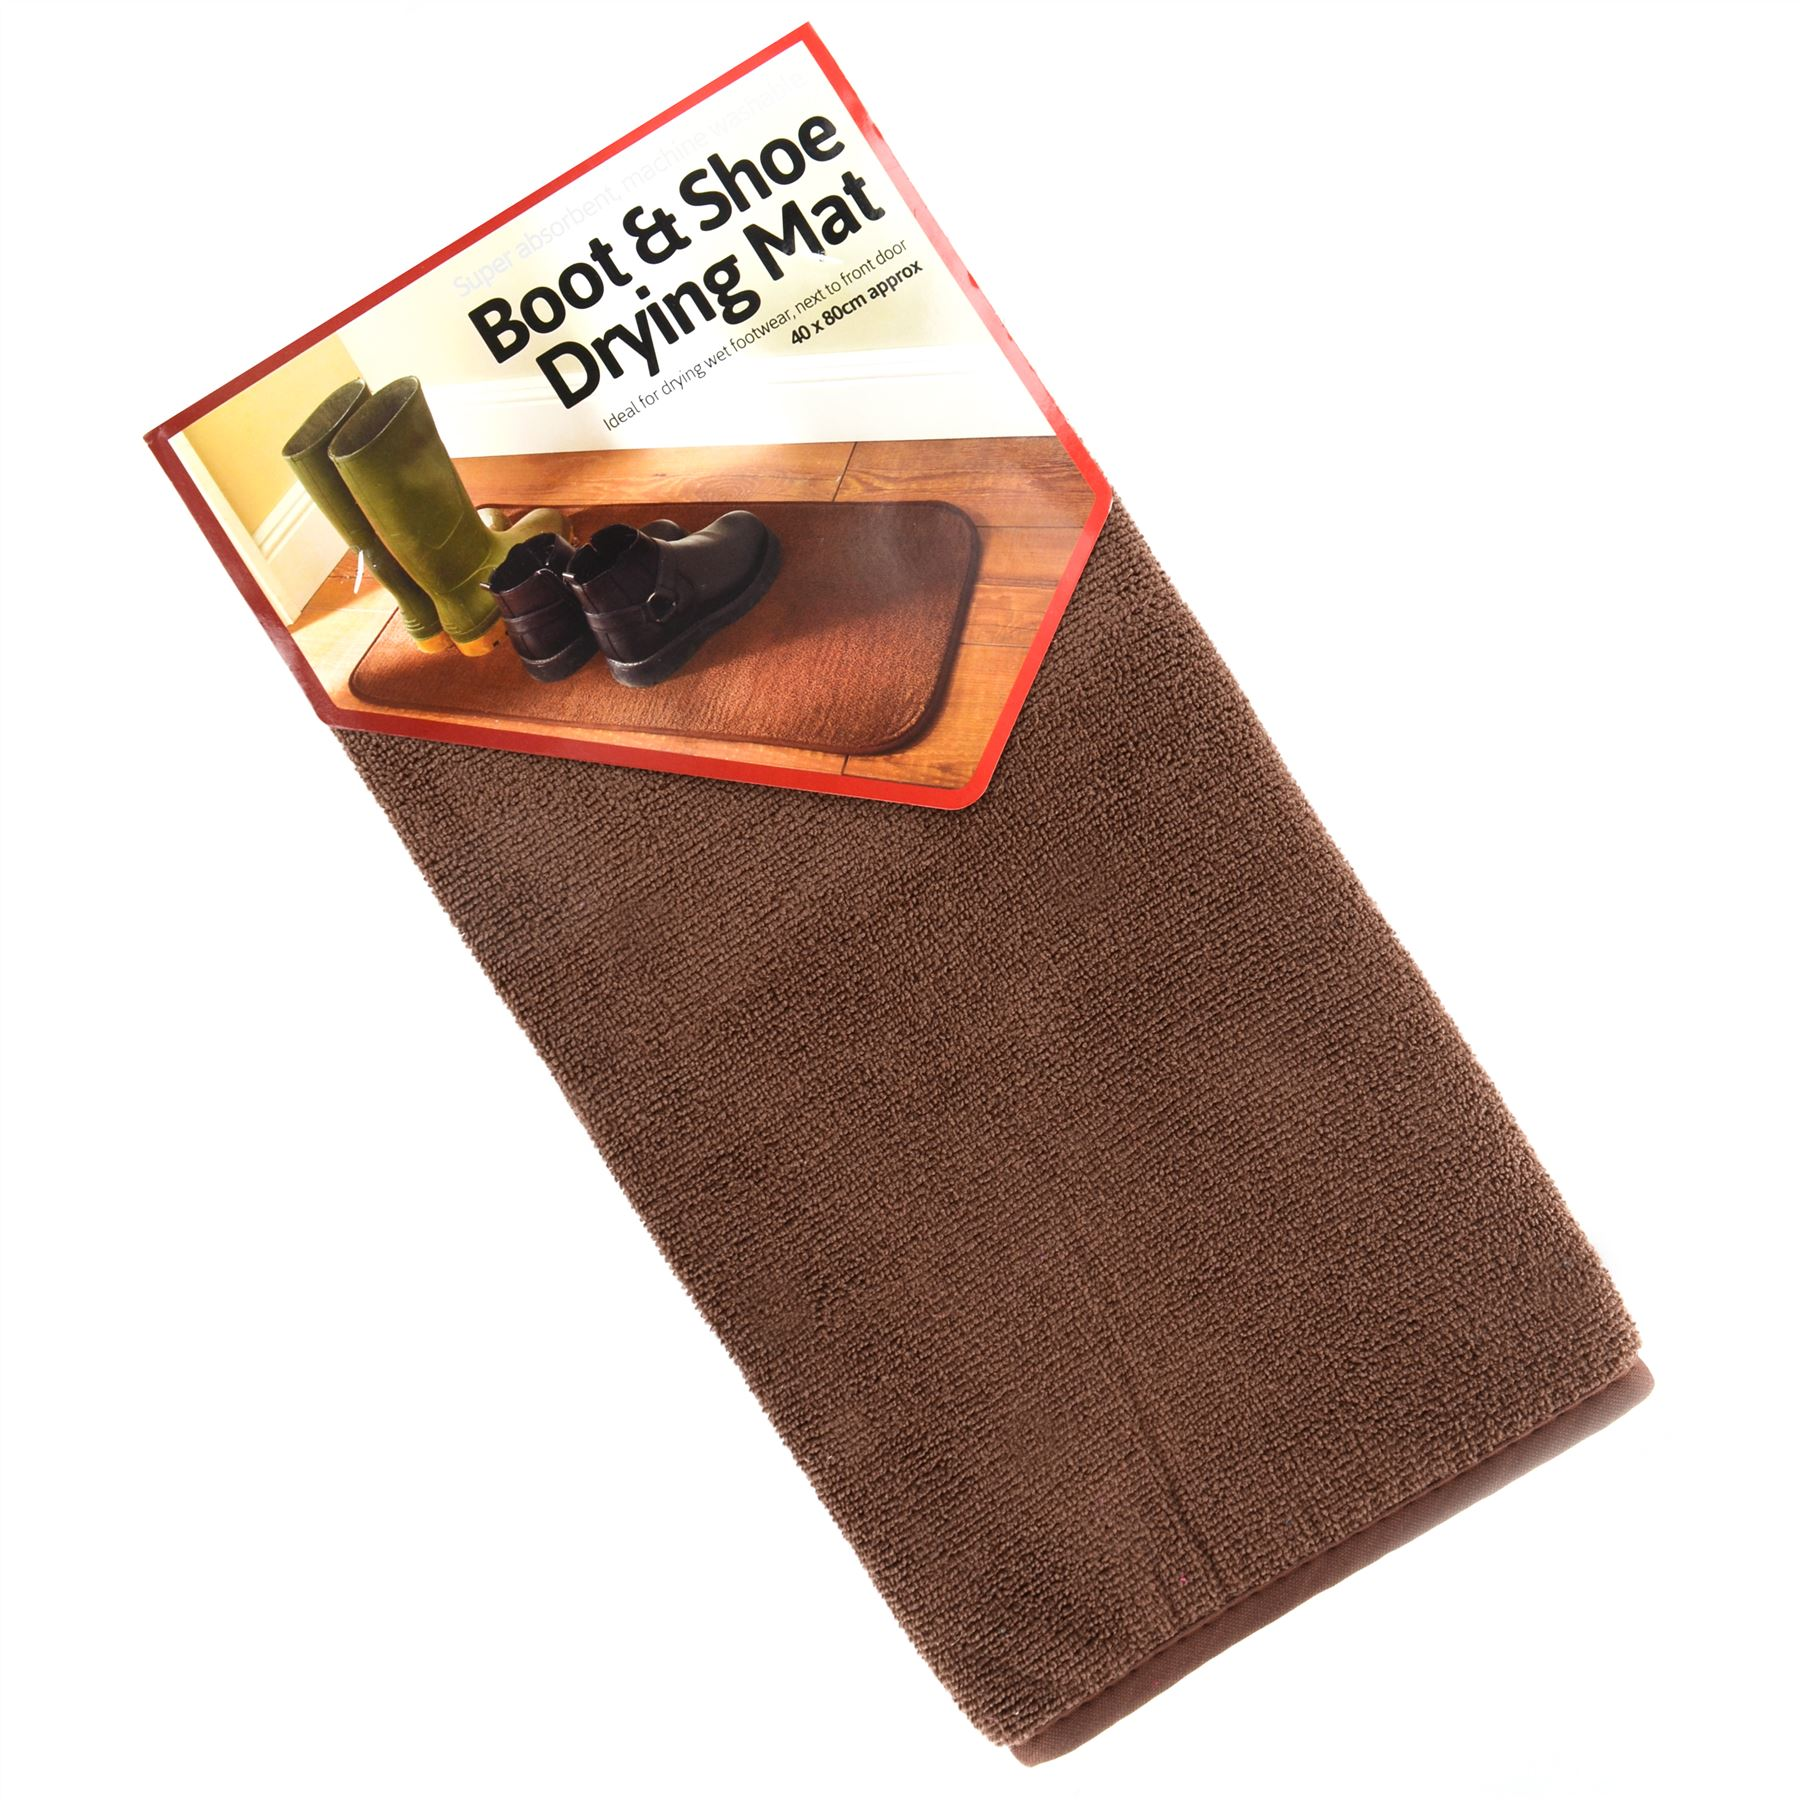 New Washable Non Slip Boot Shoe Drying Door Mat Home